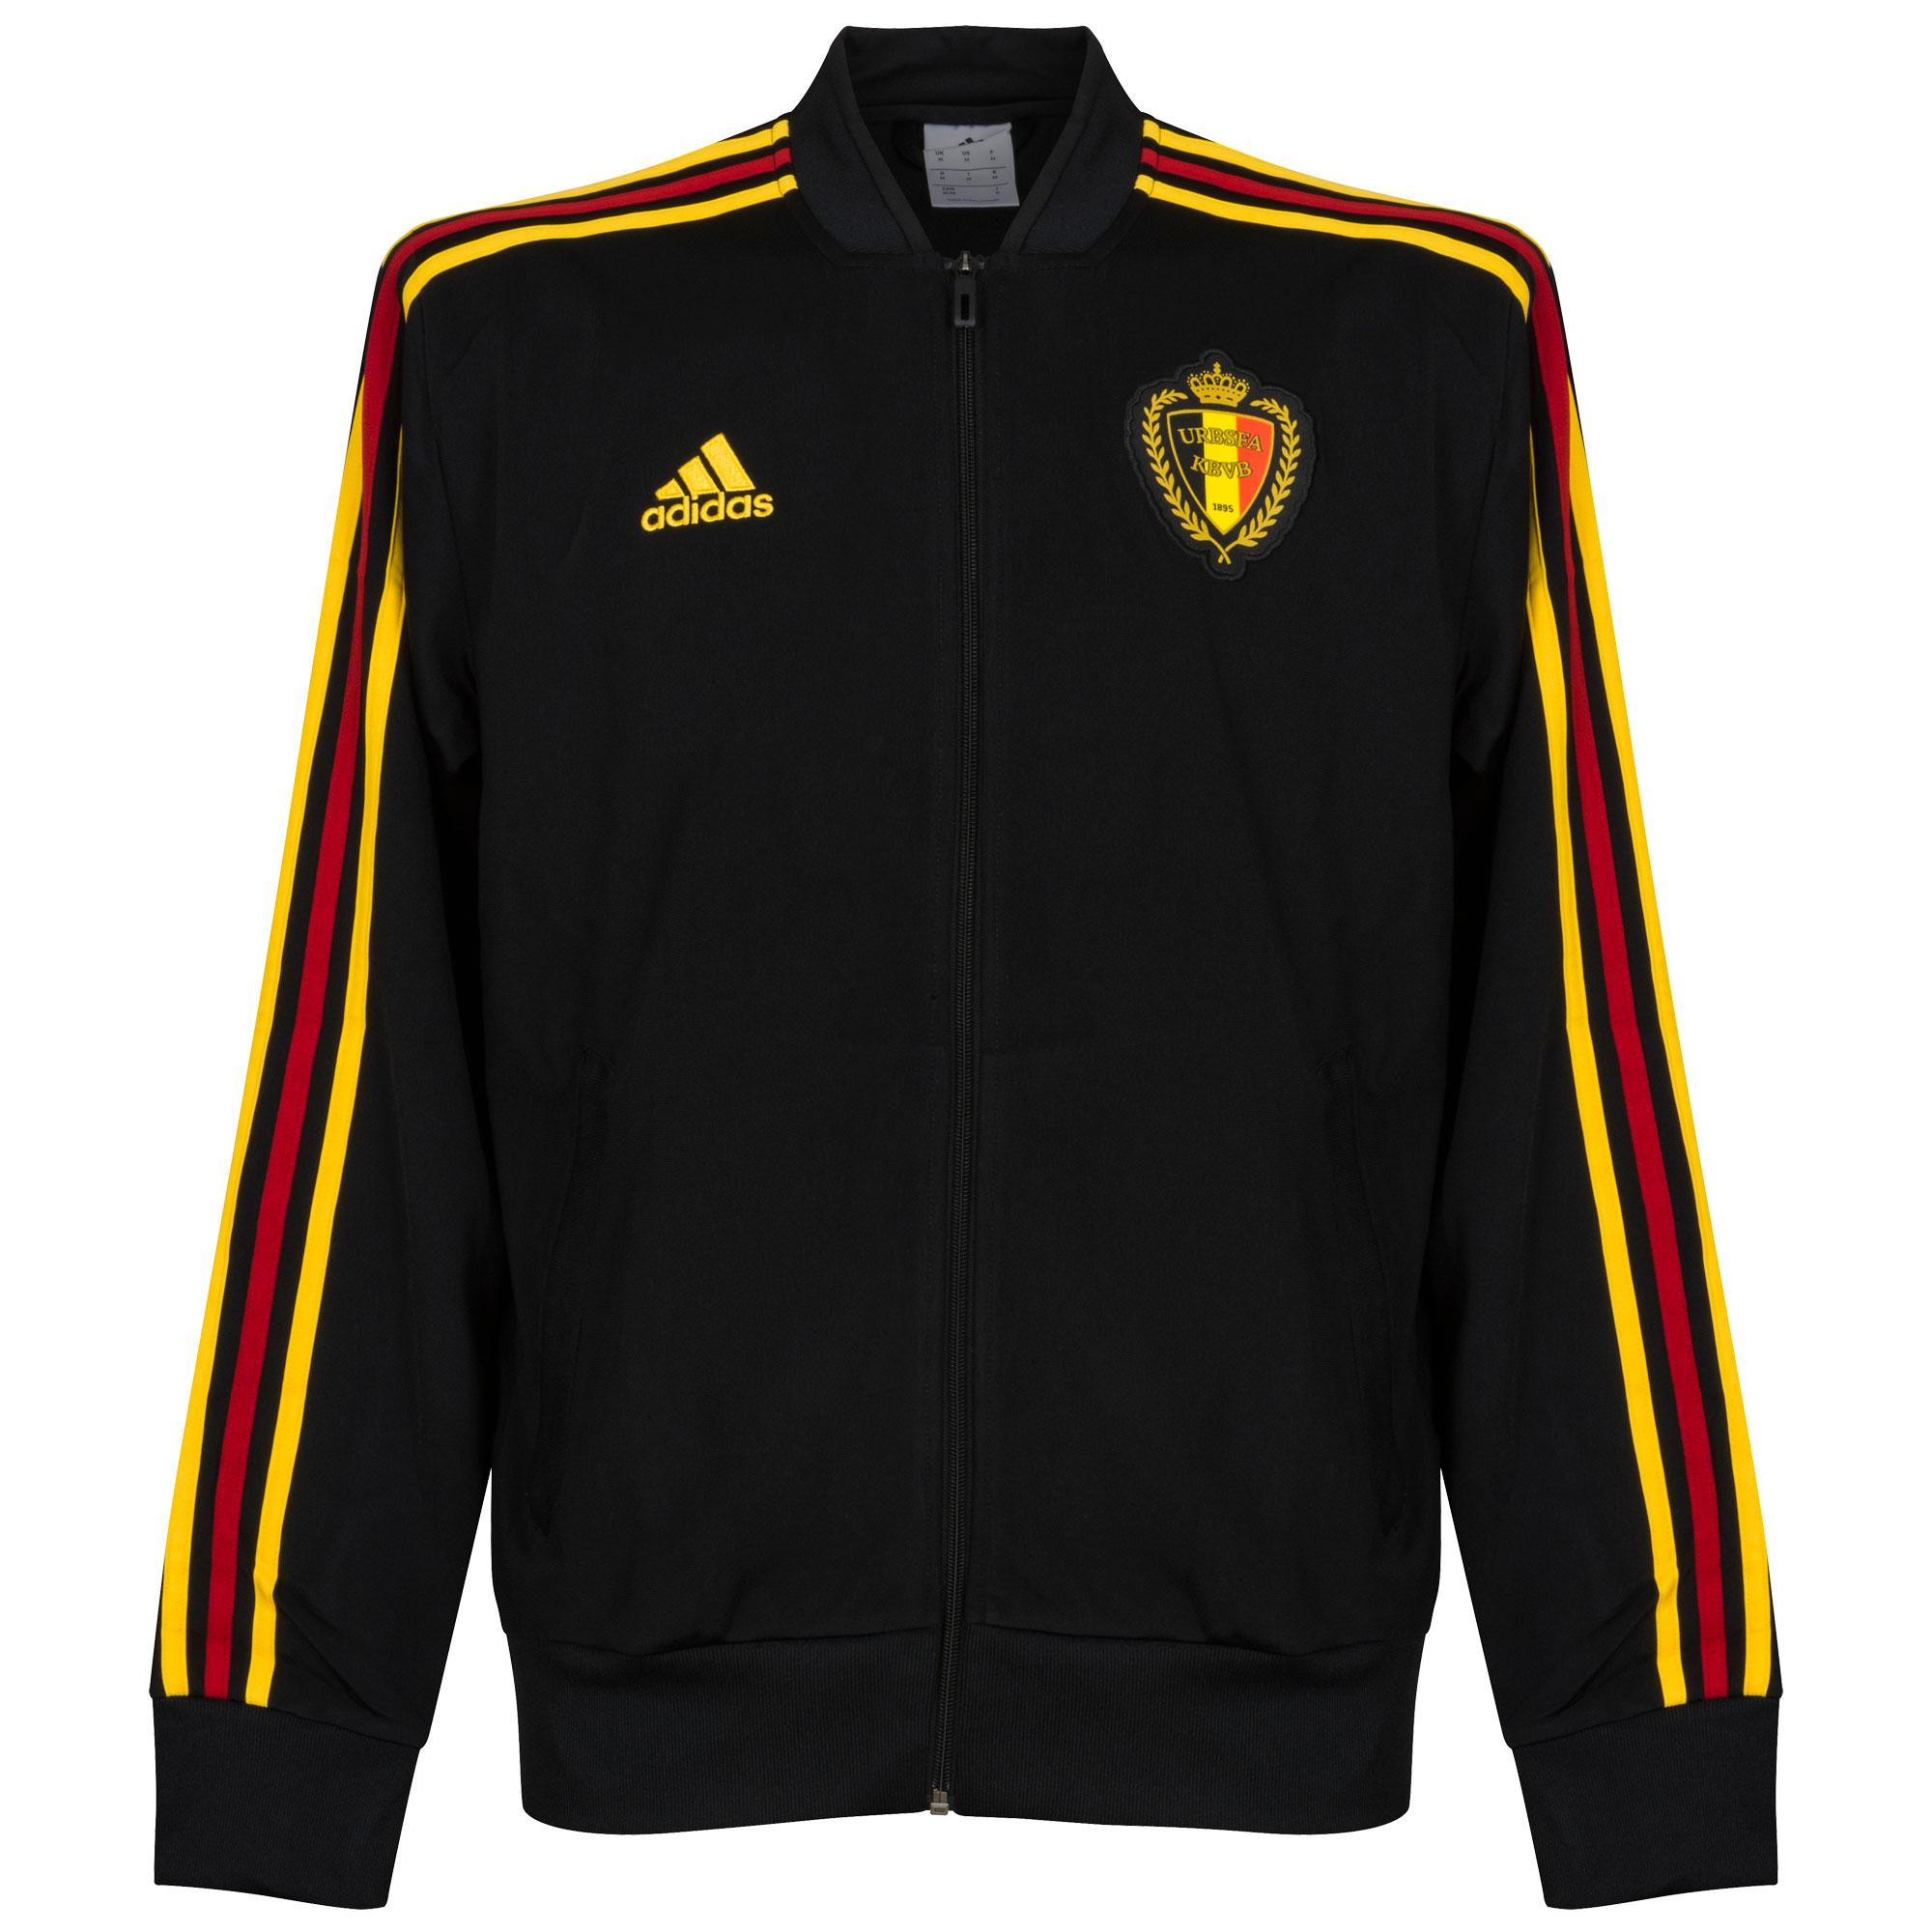 Belgium PES Jacket 2018 / 2019 - Black - 50